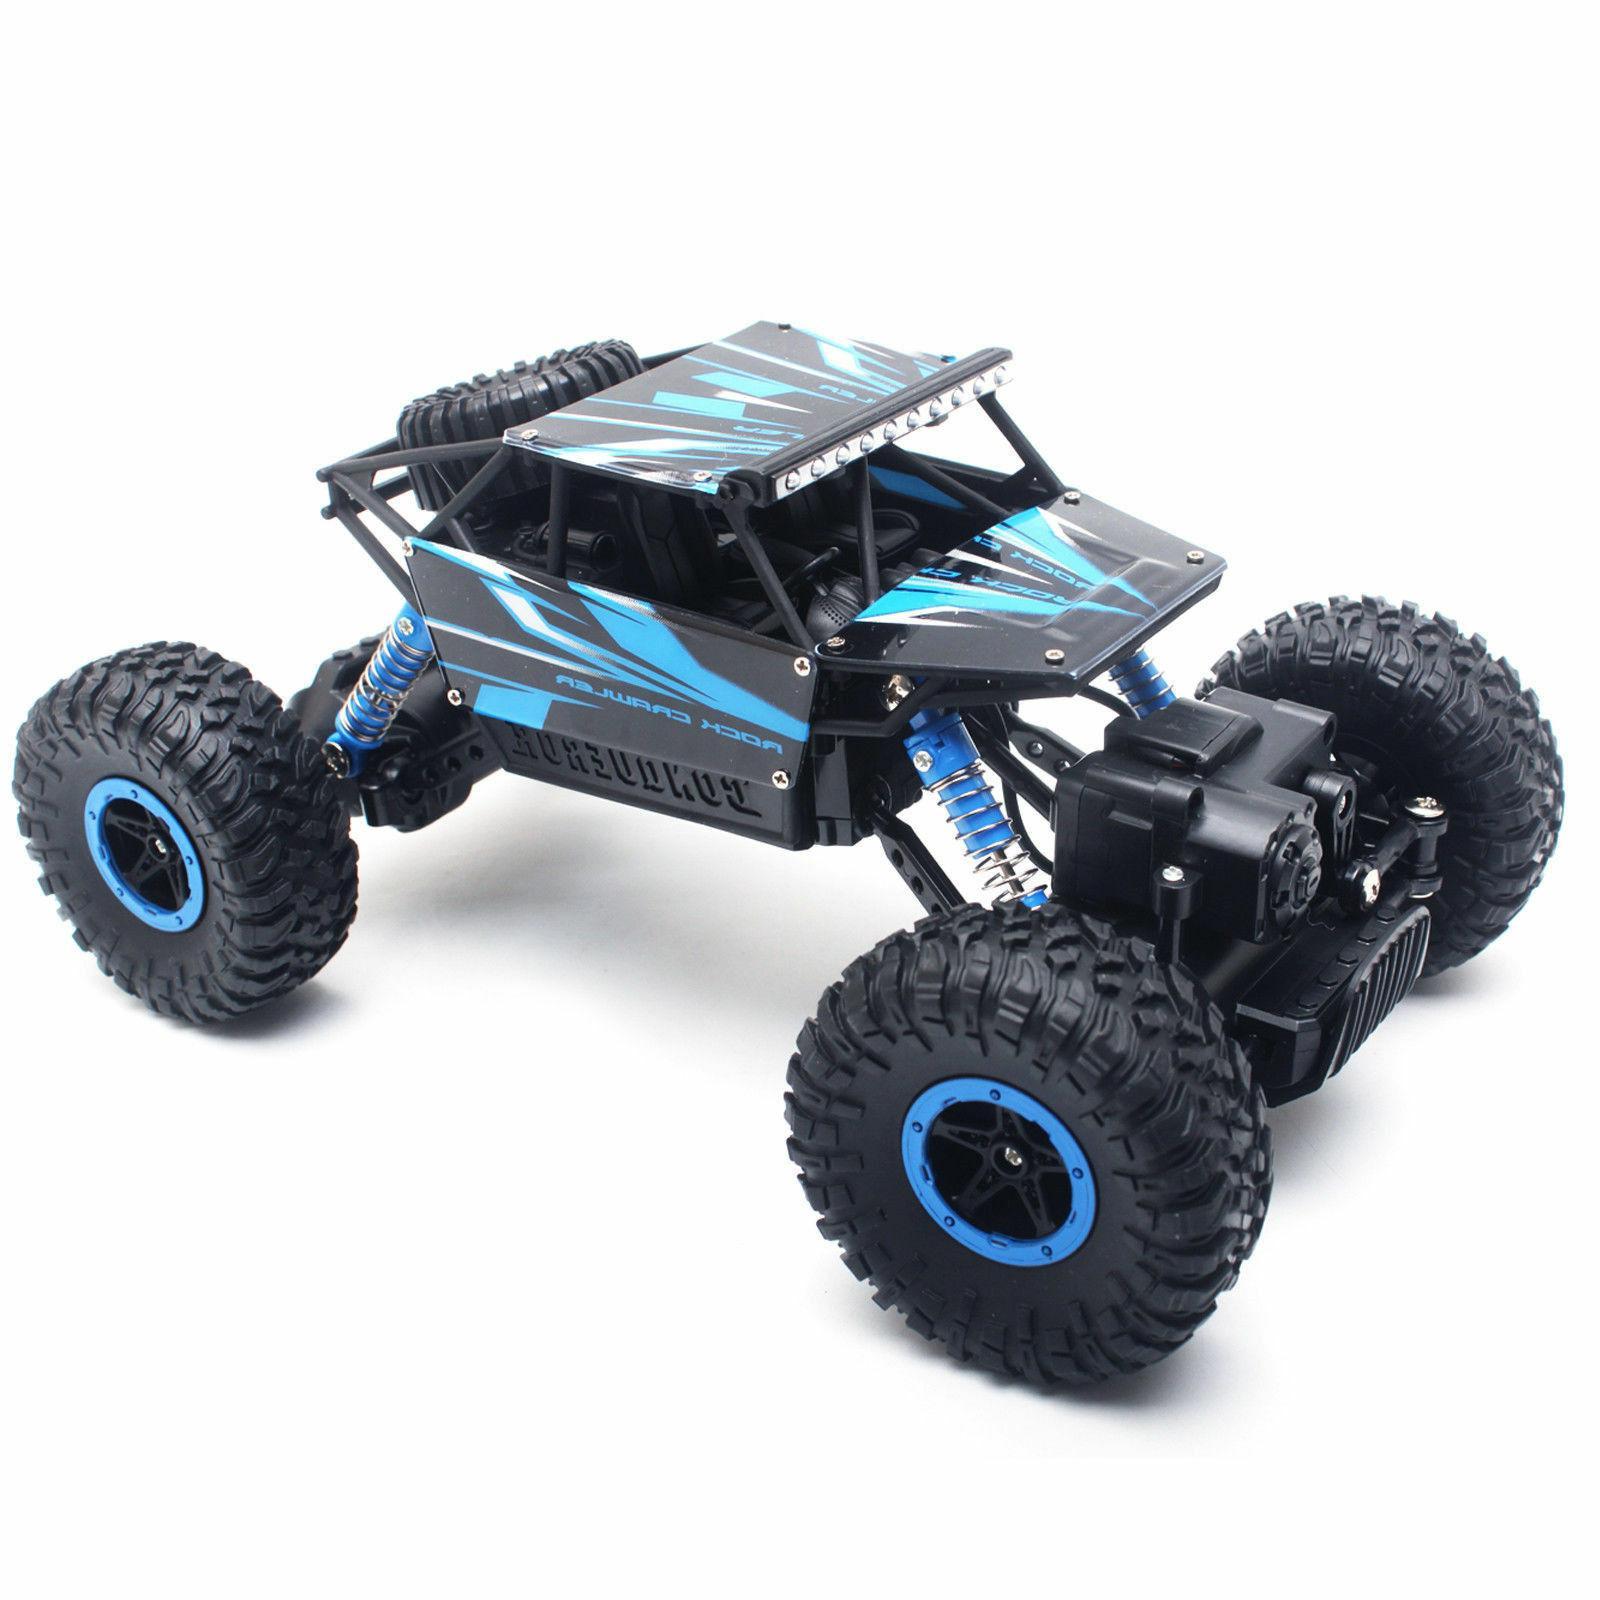 4WD 1/18 Crawler Car Vehicle 2.4Ghz Remote Car